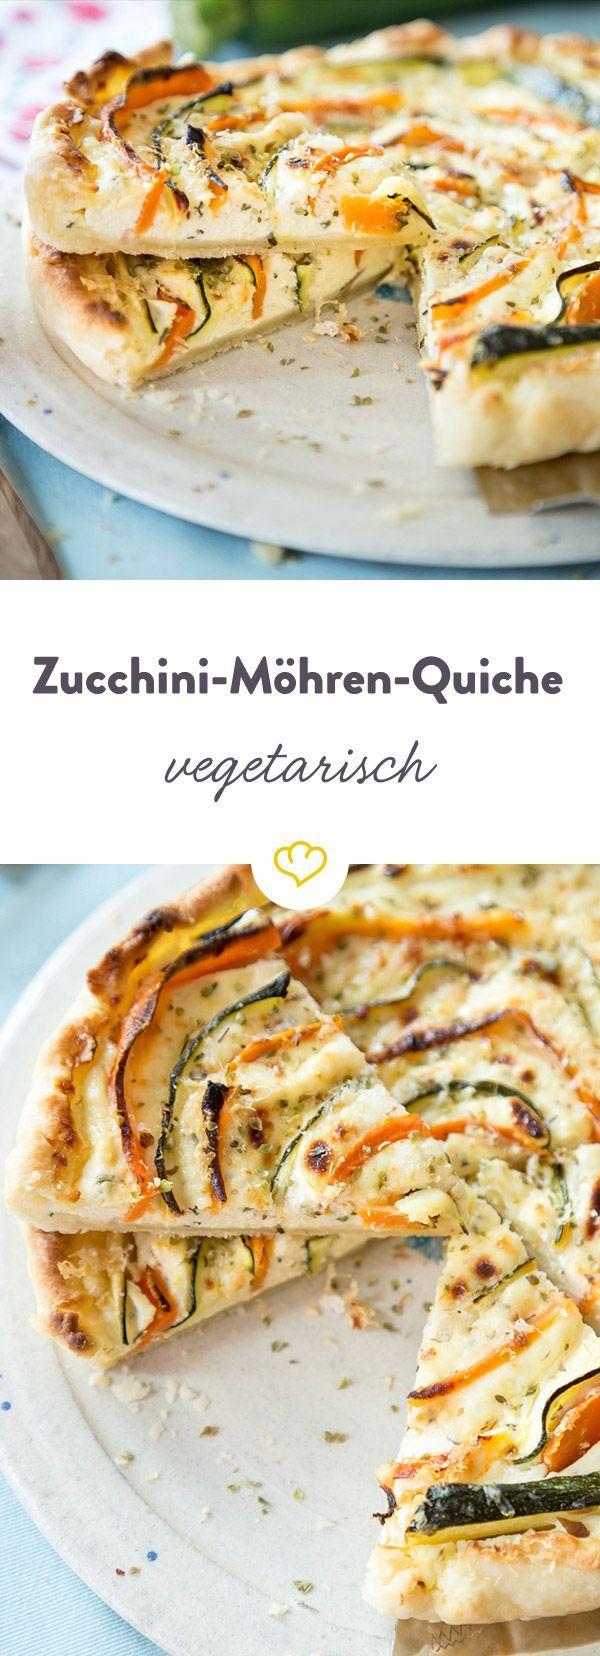 Photo of Zucchini and carrot quiche